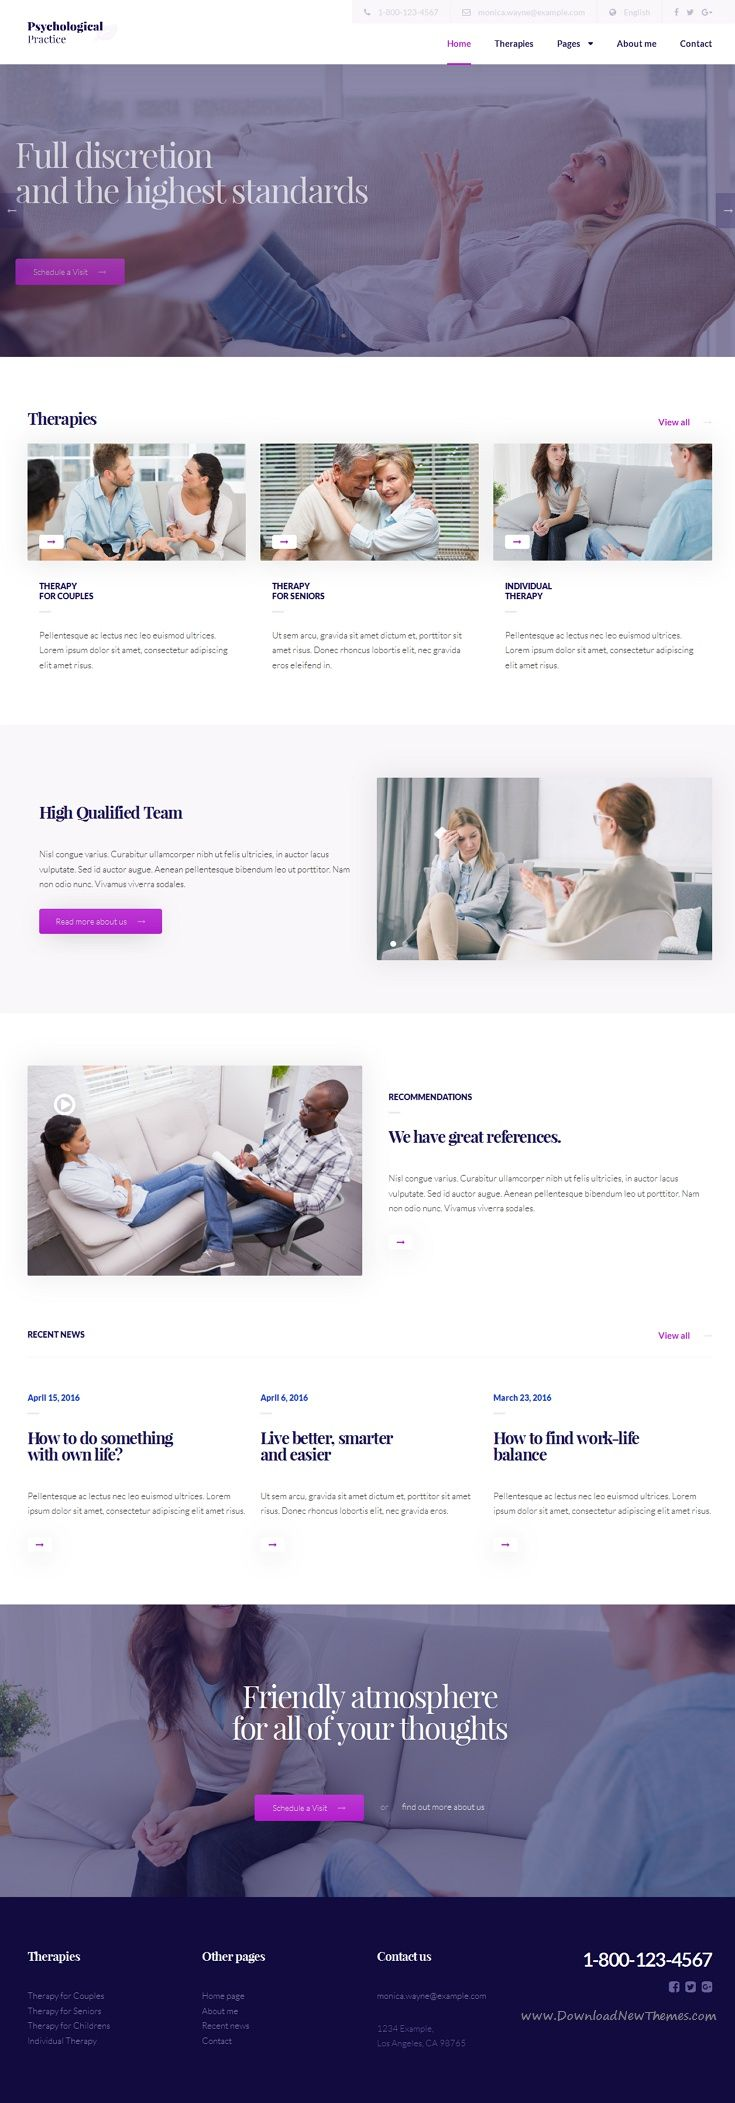 Psychology - HTML5 template for Psychological Practice | Pinterest ...